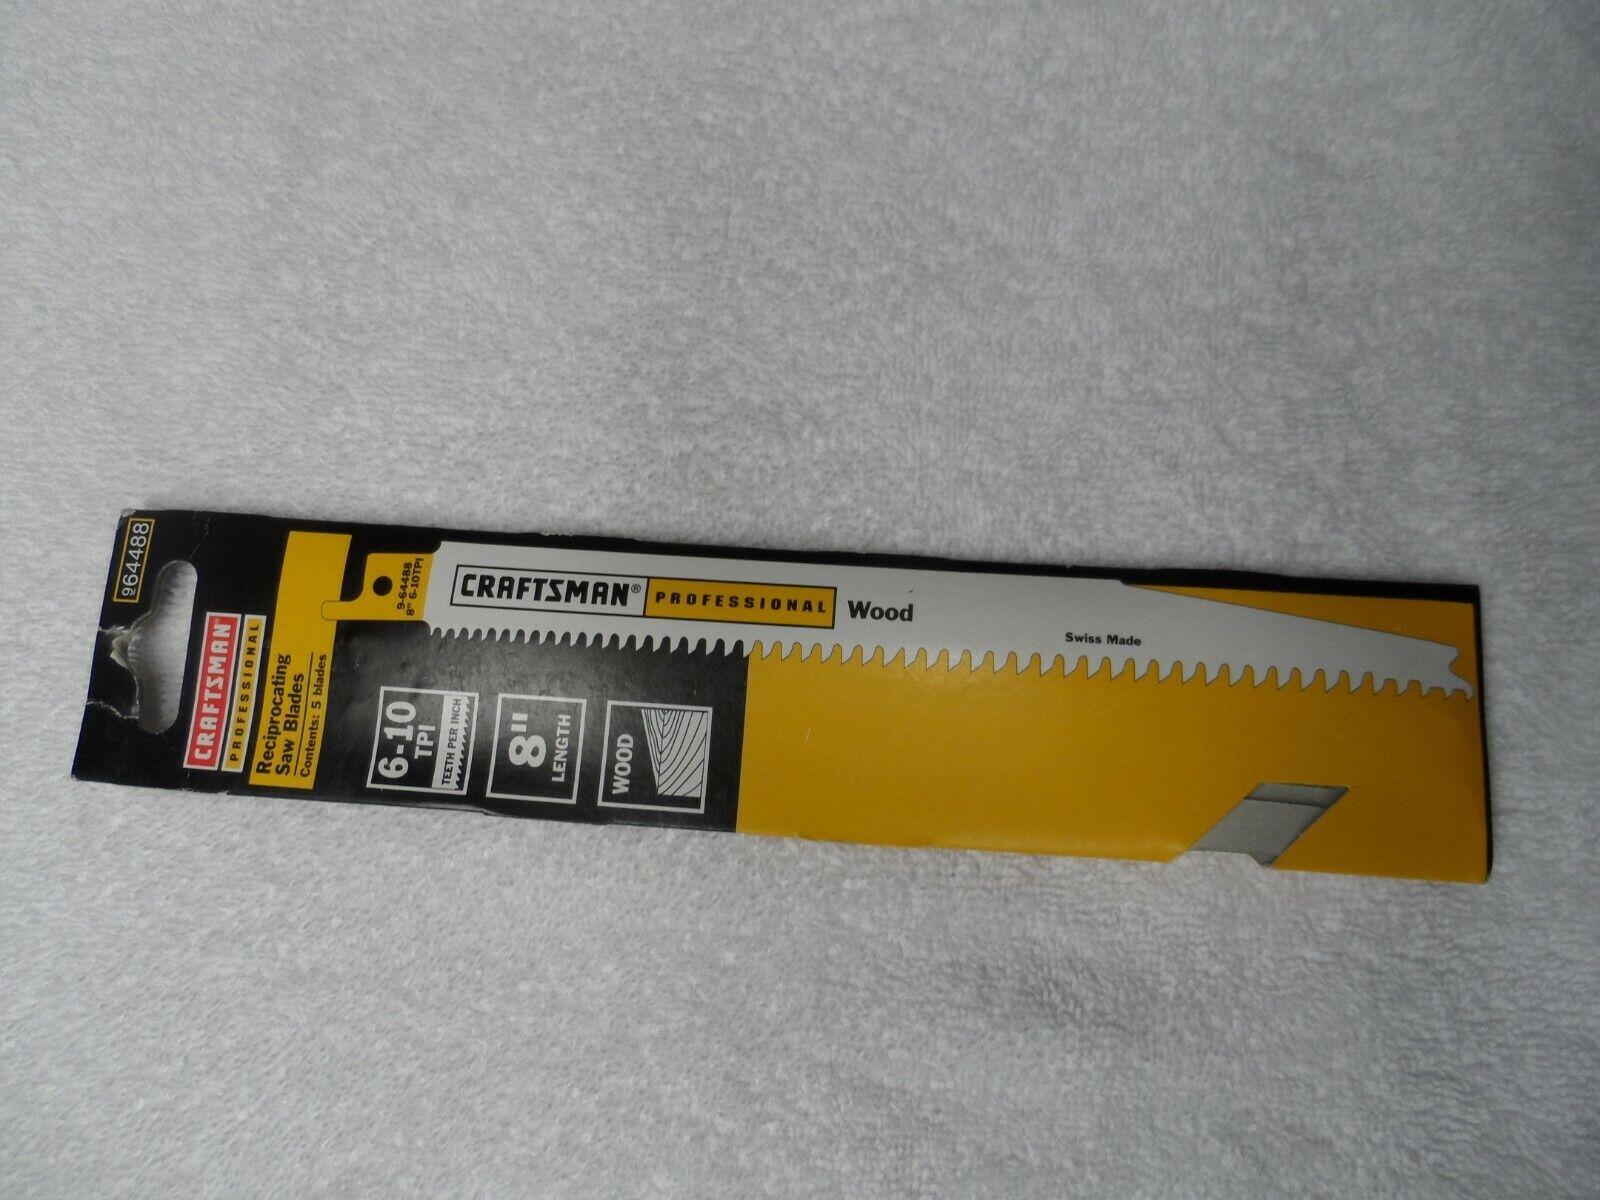 "Craftsman 64488 6-10 TPI 8"" Reciprocating Saw Wood/Nails 2 B"